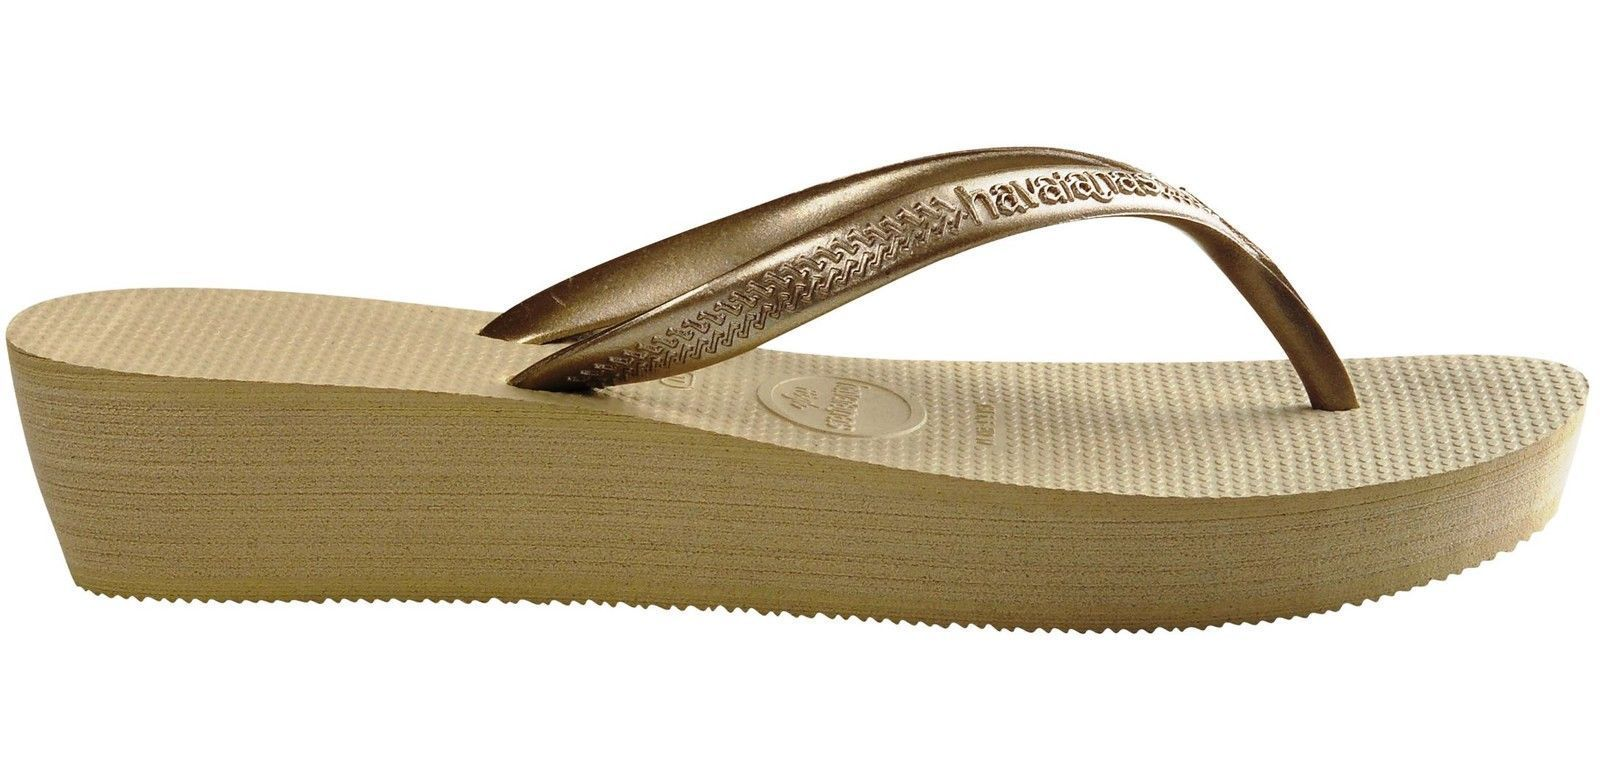 f39c3dfa3 Havaianas High Light Wedge Flip Flop Thong Sandal - Womens